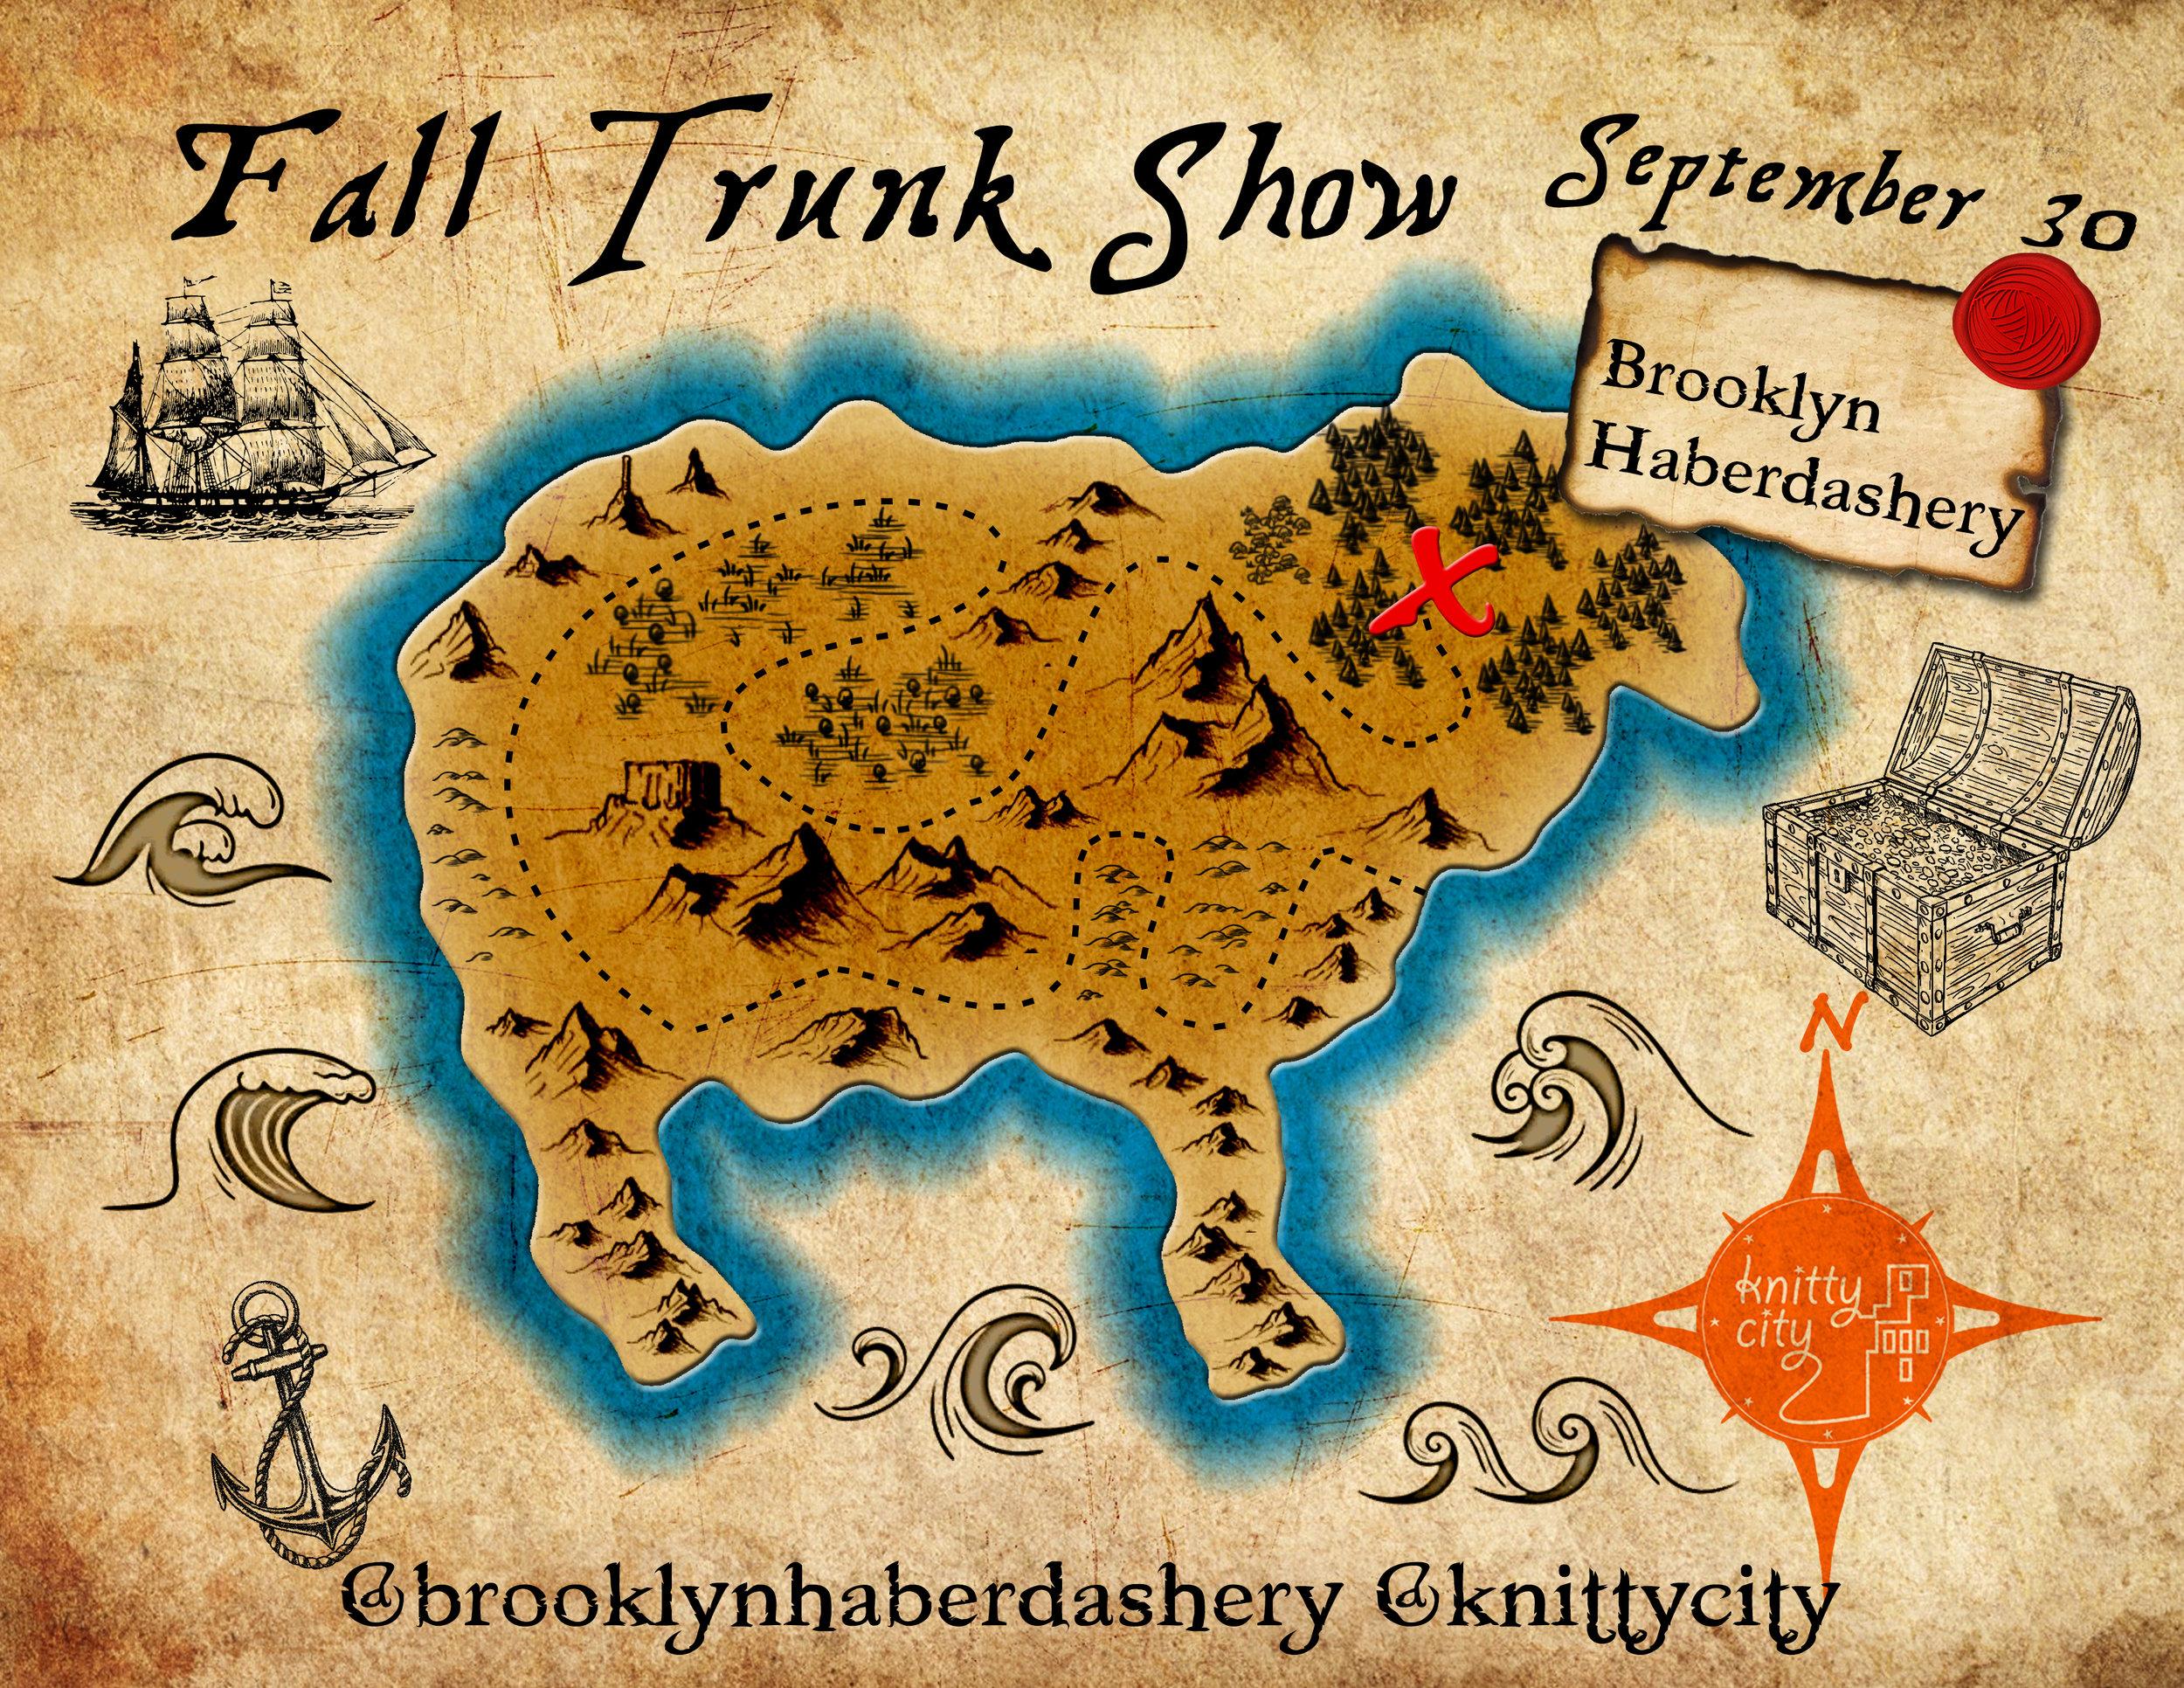 Treasure Map Brooklyn Haberdashery.jpg